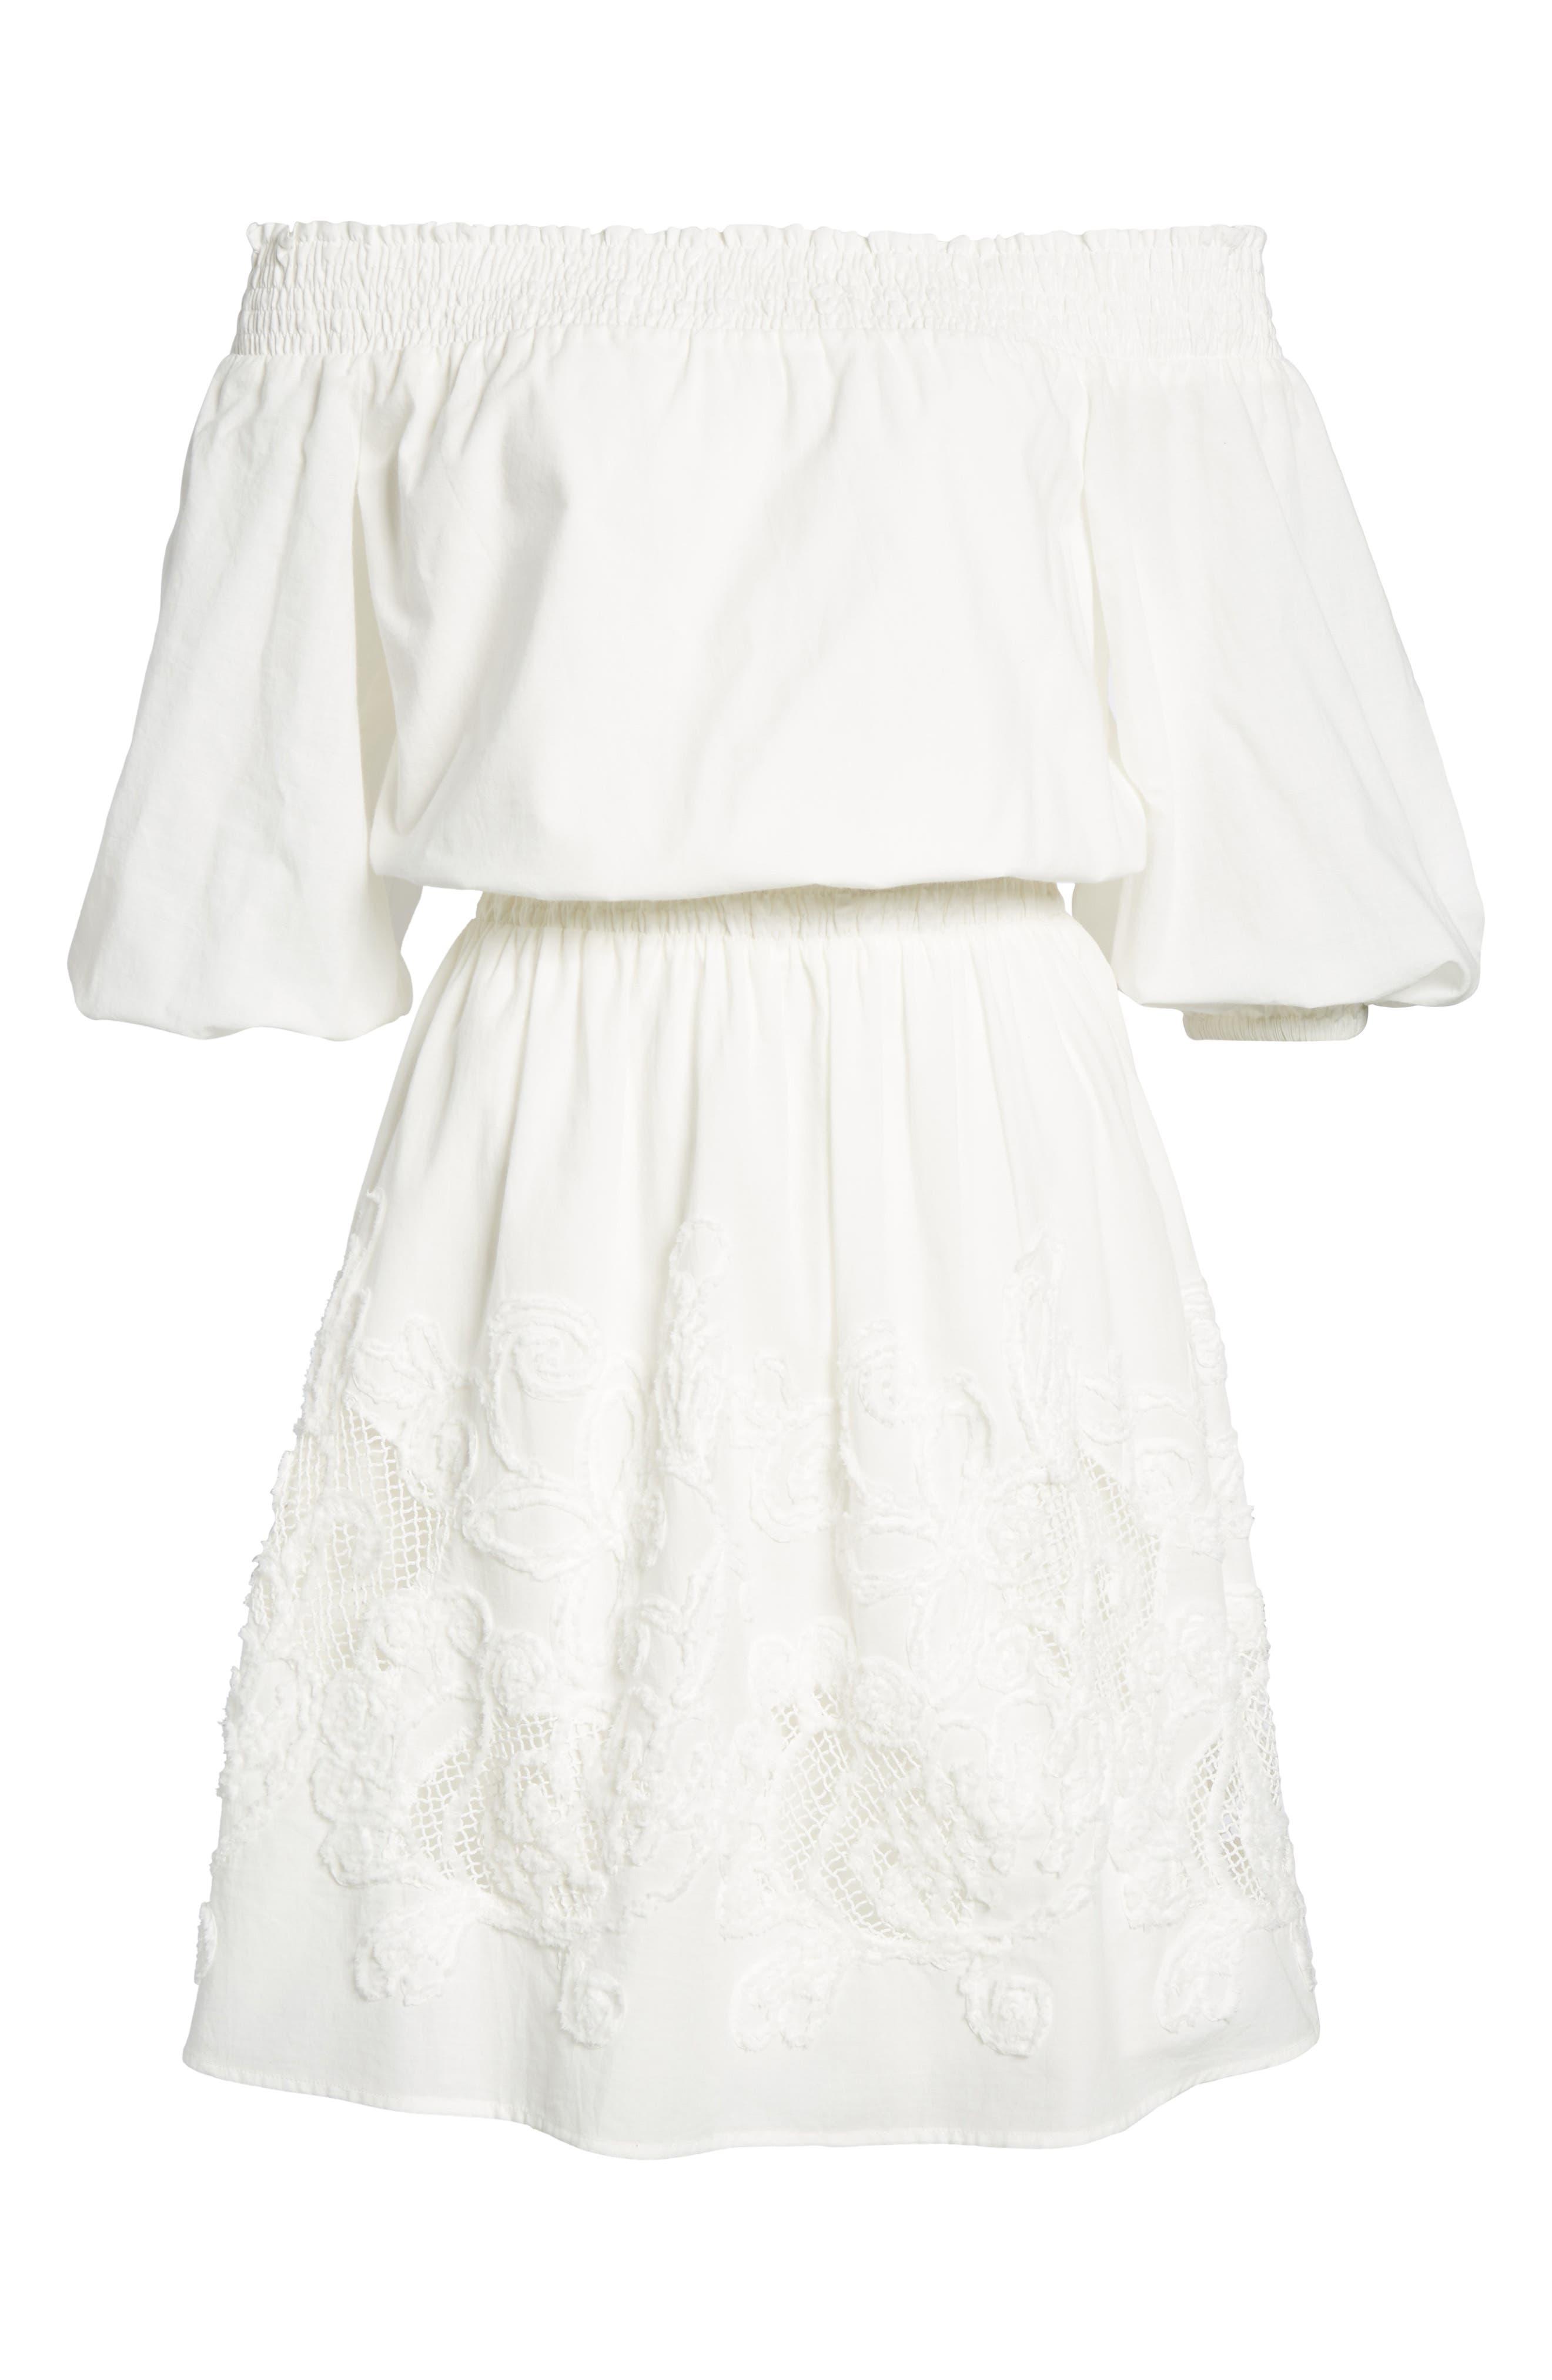 Embroidered Off the Shoulder Blouson Dress,                             Alternate thumbnail 6, color,                             100